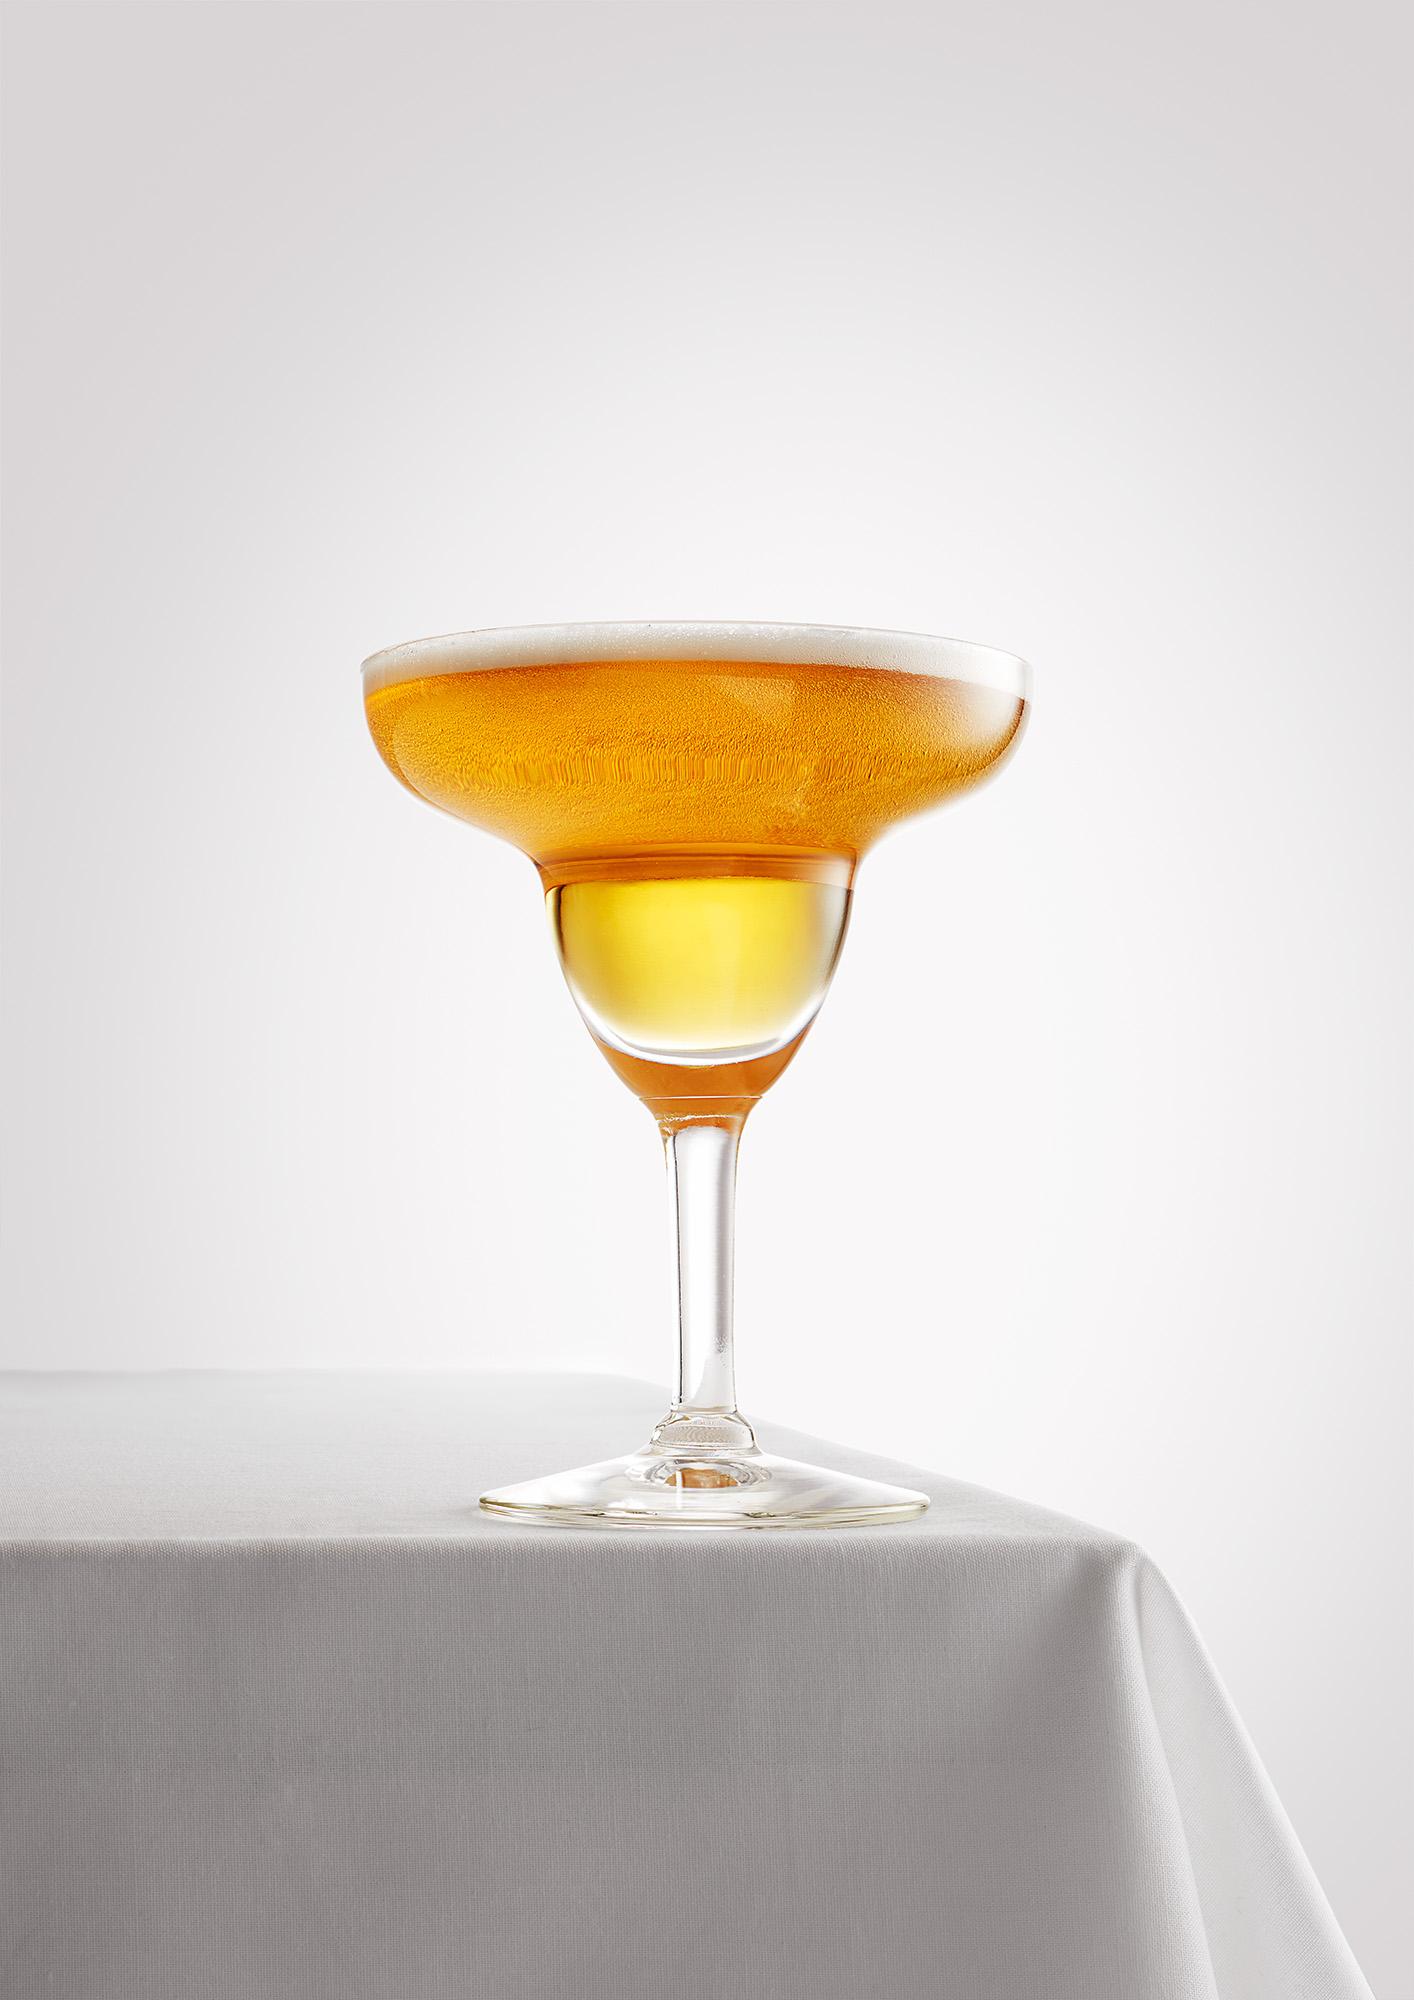 The Pale Ale Margarita